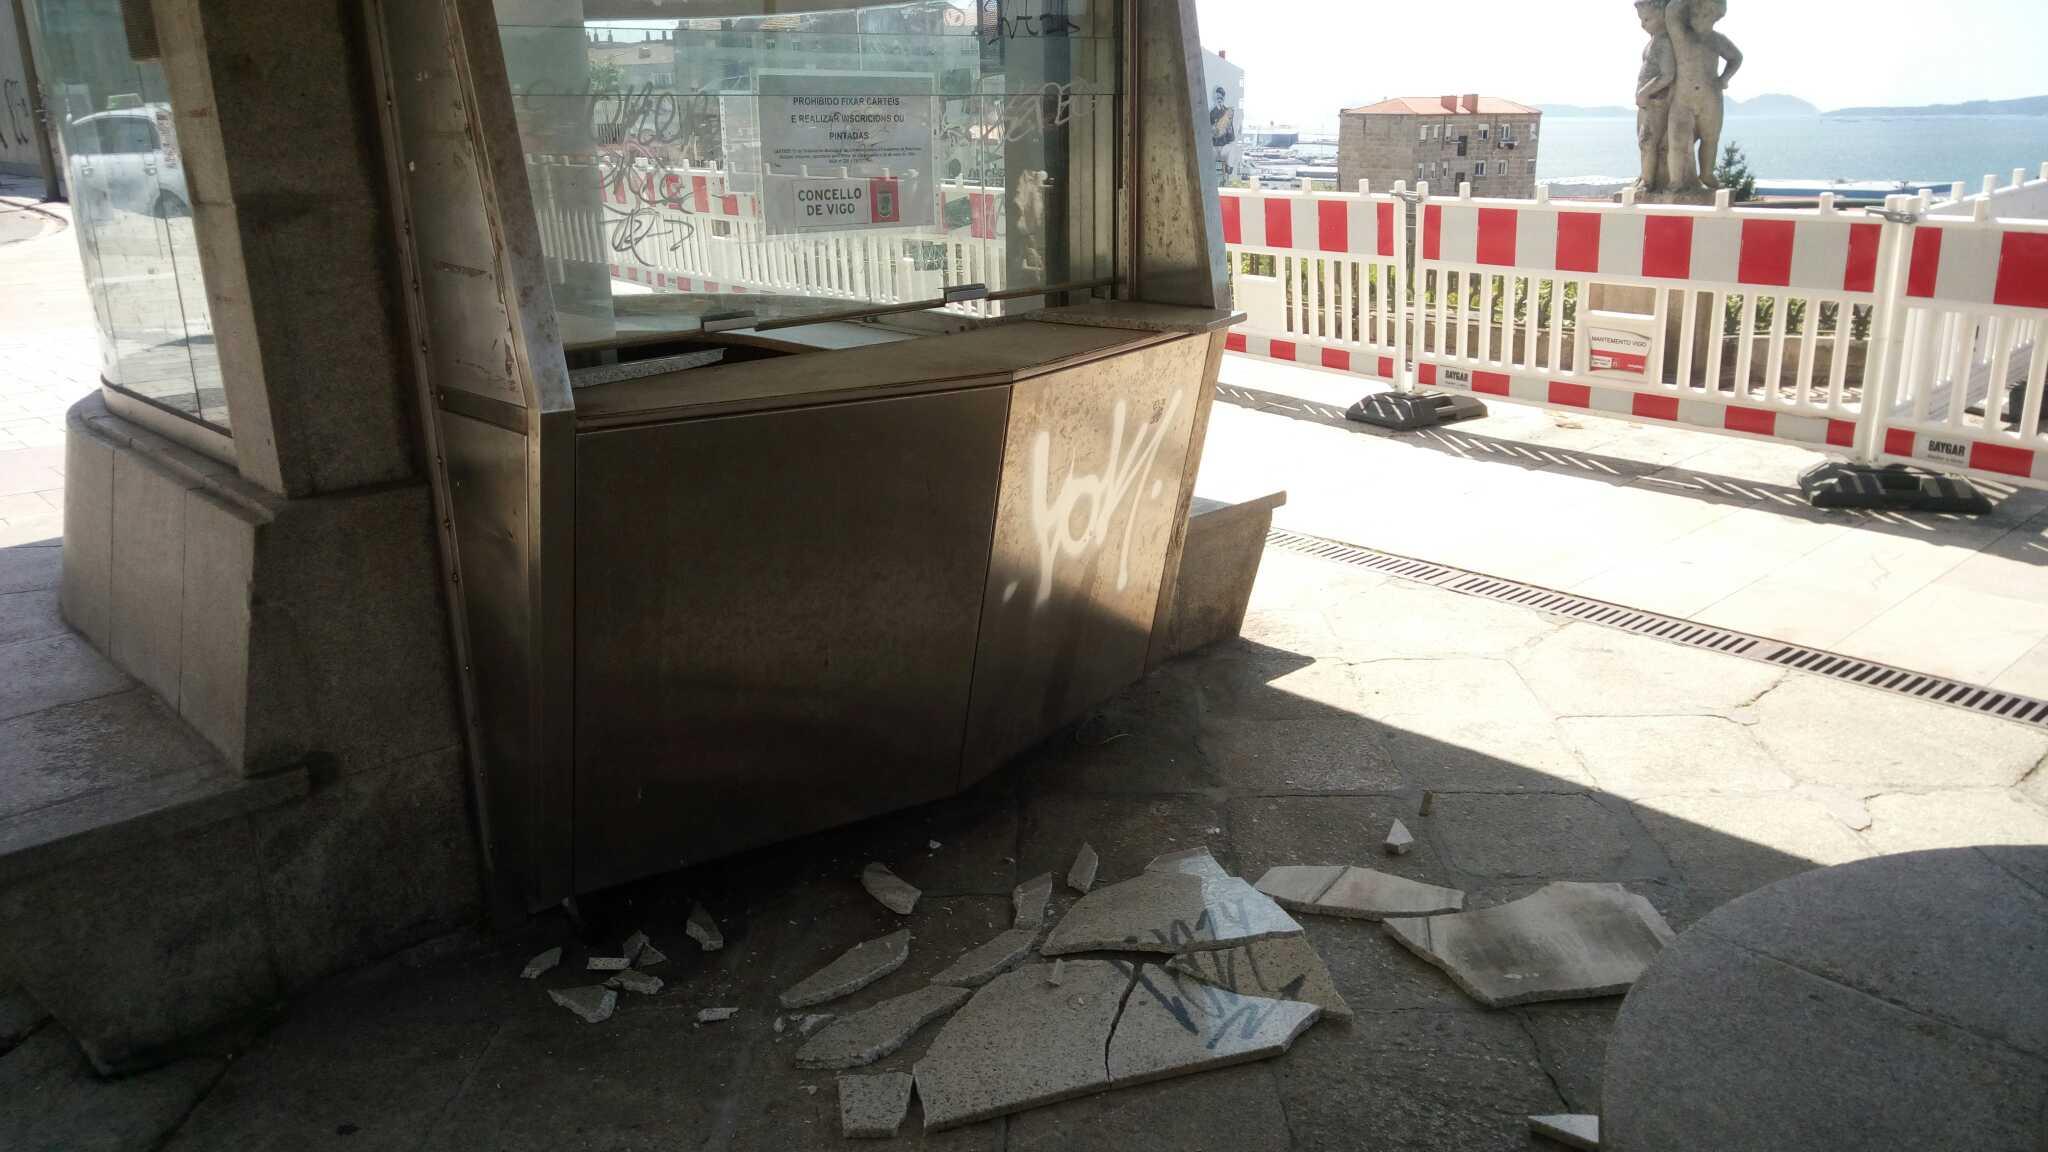 Detenido tras causar daños al antiguo kiosco del Paseo de Alfonso